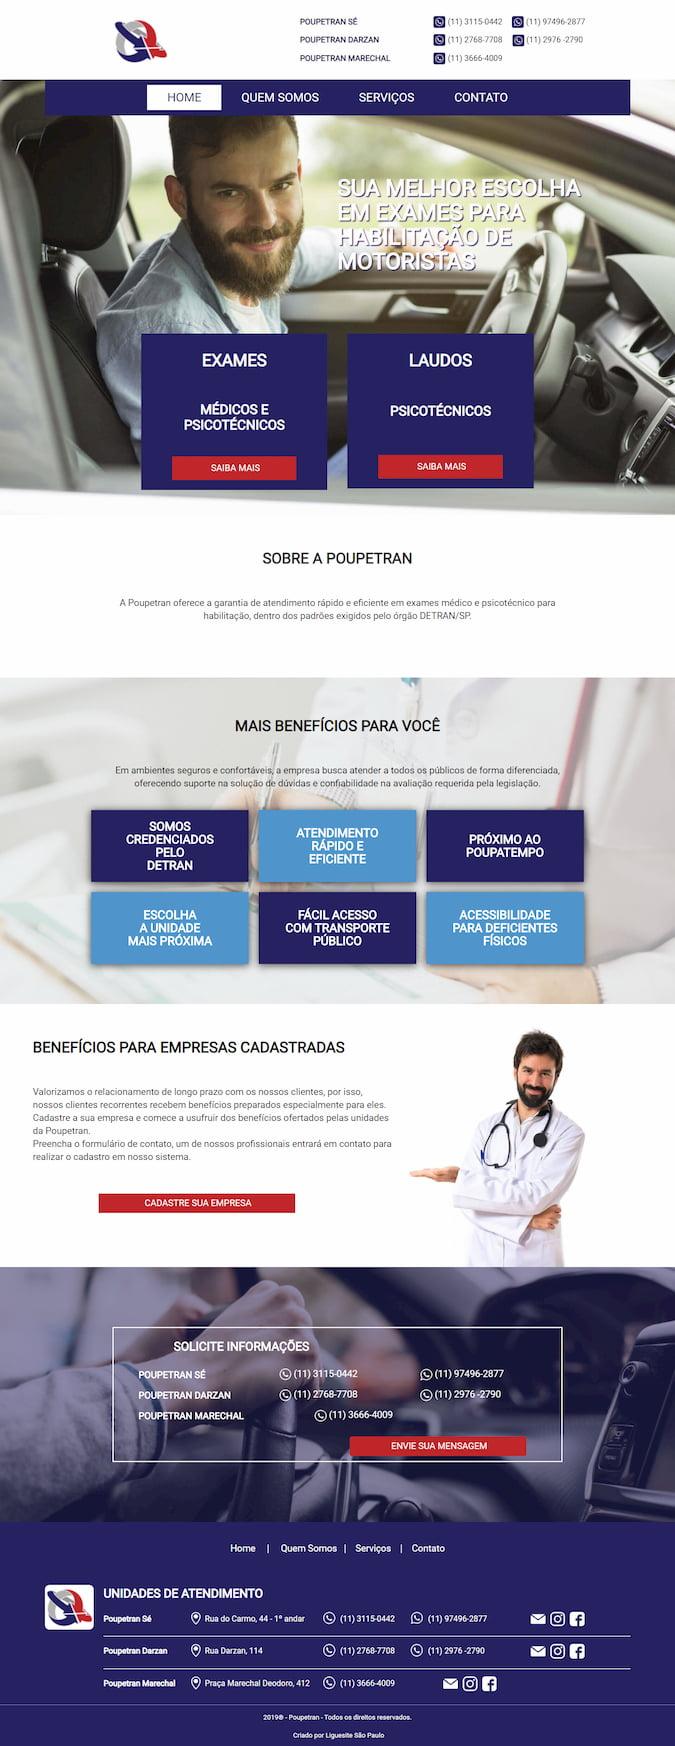 POUPETRAN - EXAMES MÉDICOS E PSICOTÉCNICOS